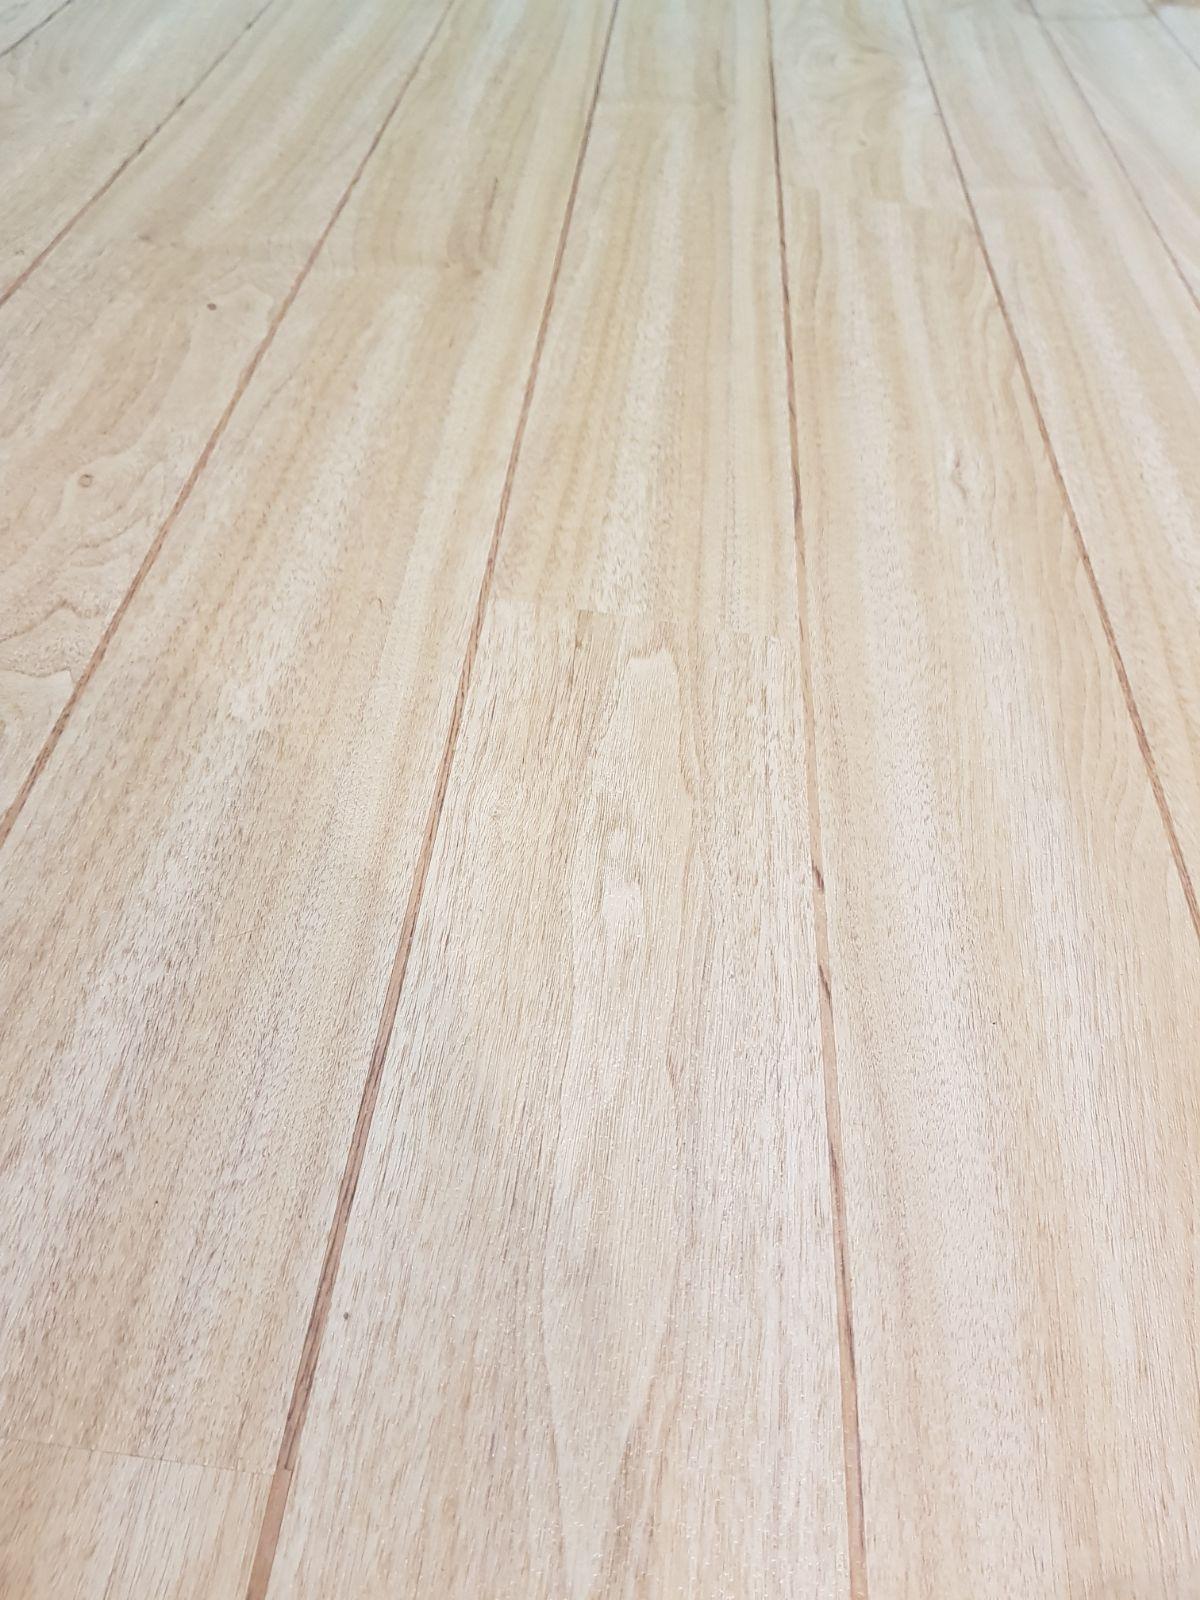 Final Finish Flooring Bespoke